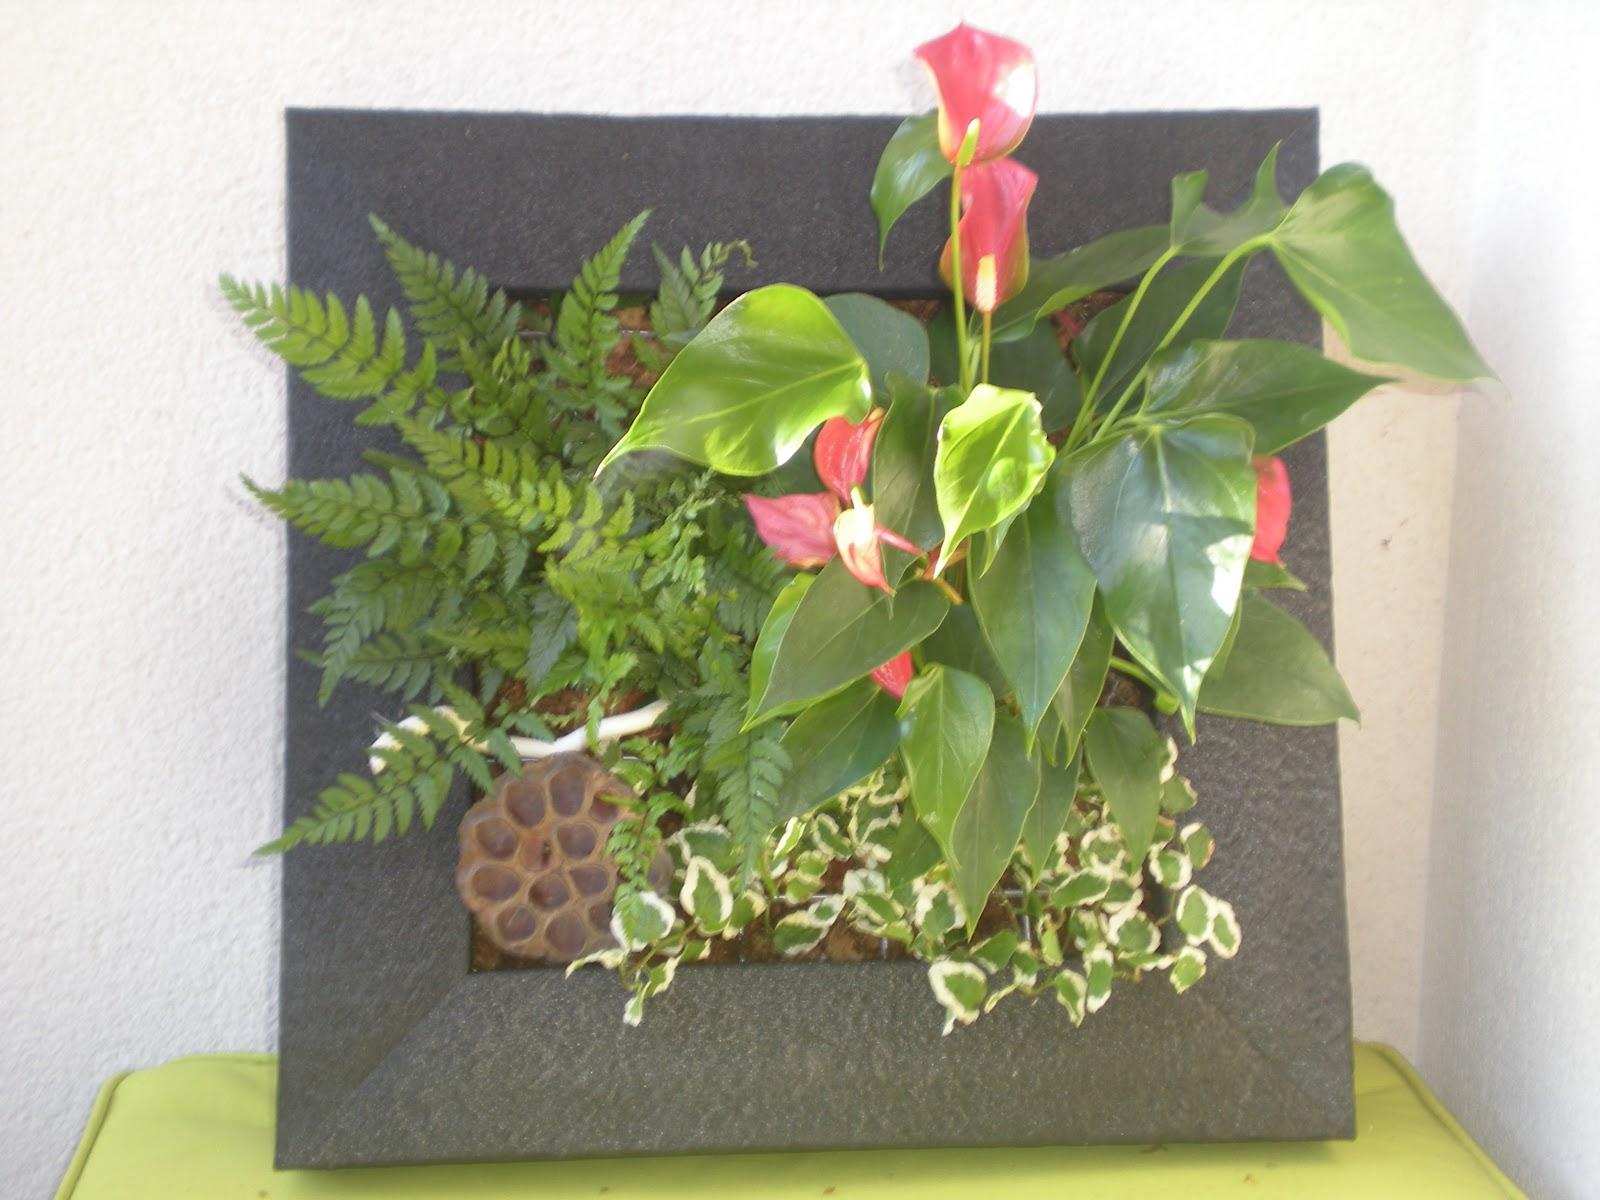 Arrels jardines verticales arrels jardins i paisatges for Jardines verticales pequenos